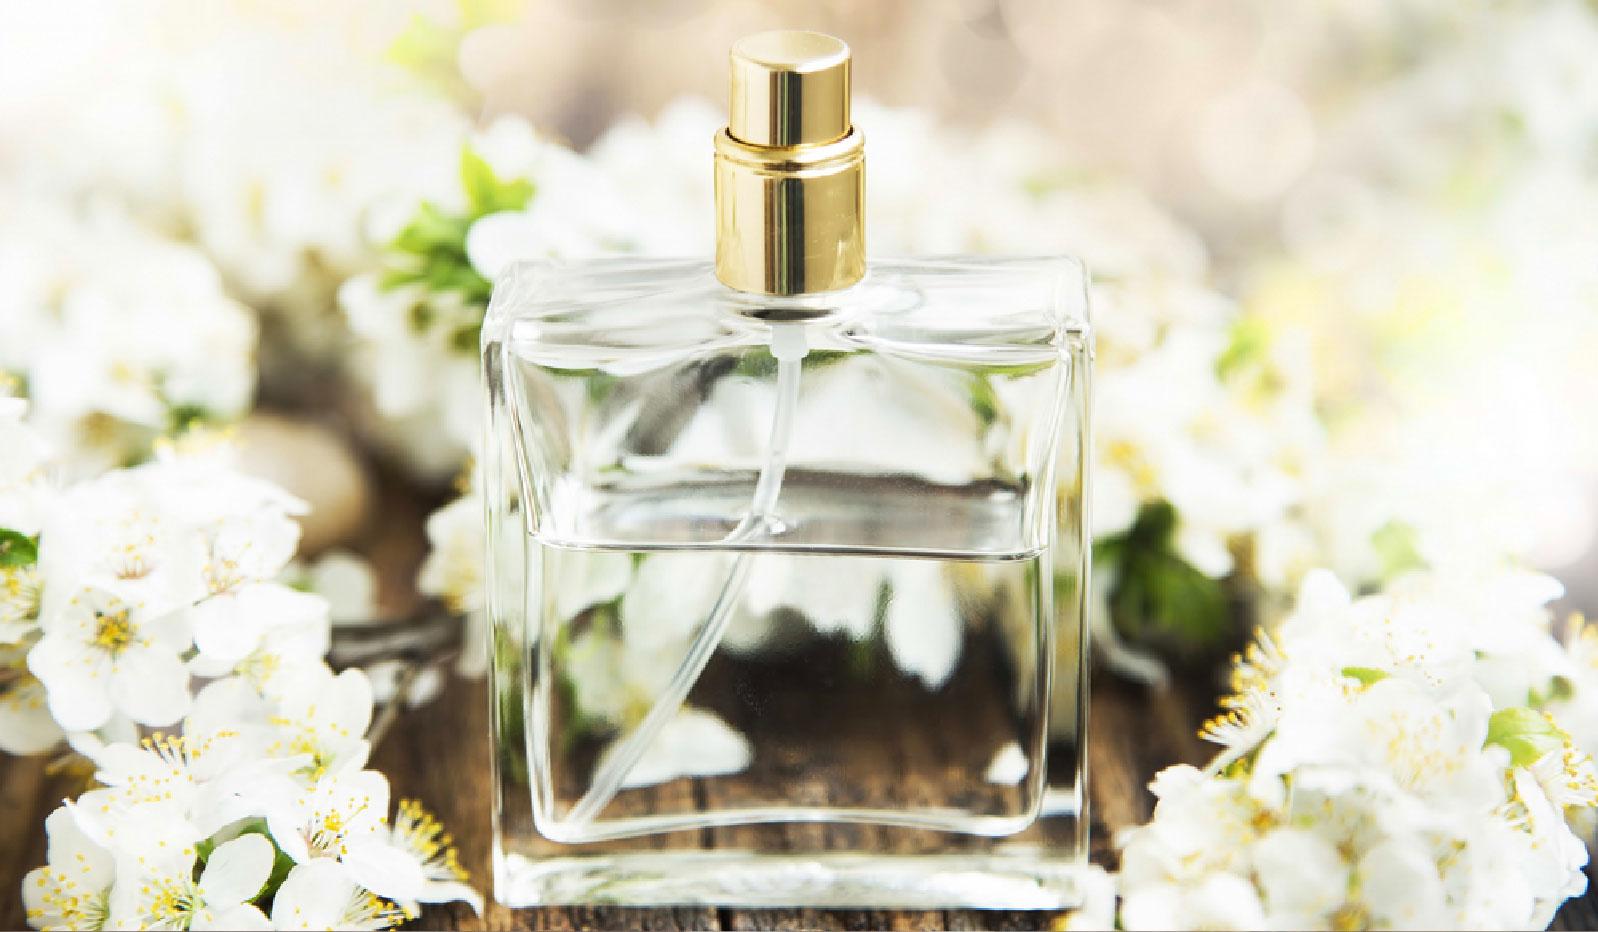 Jizan Perfumes LLC - International trader of branded perfumes